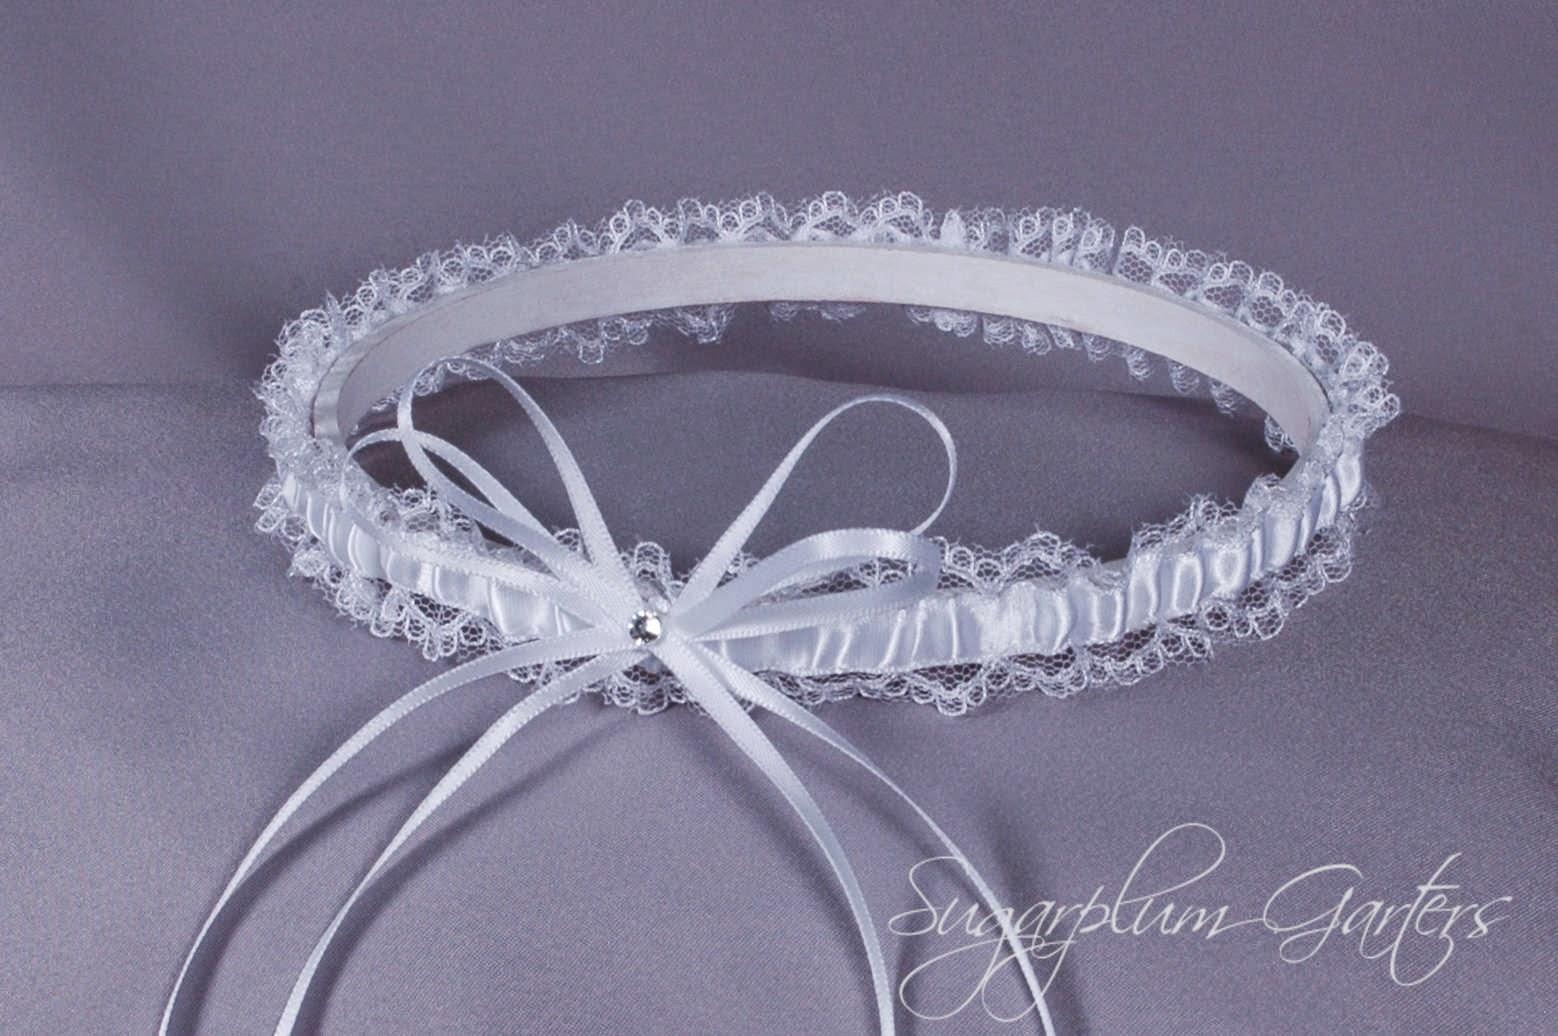 Wedding Garter in White Satin and Lace by Sugarplum Garters